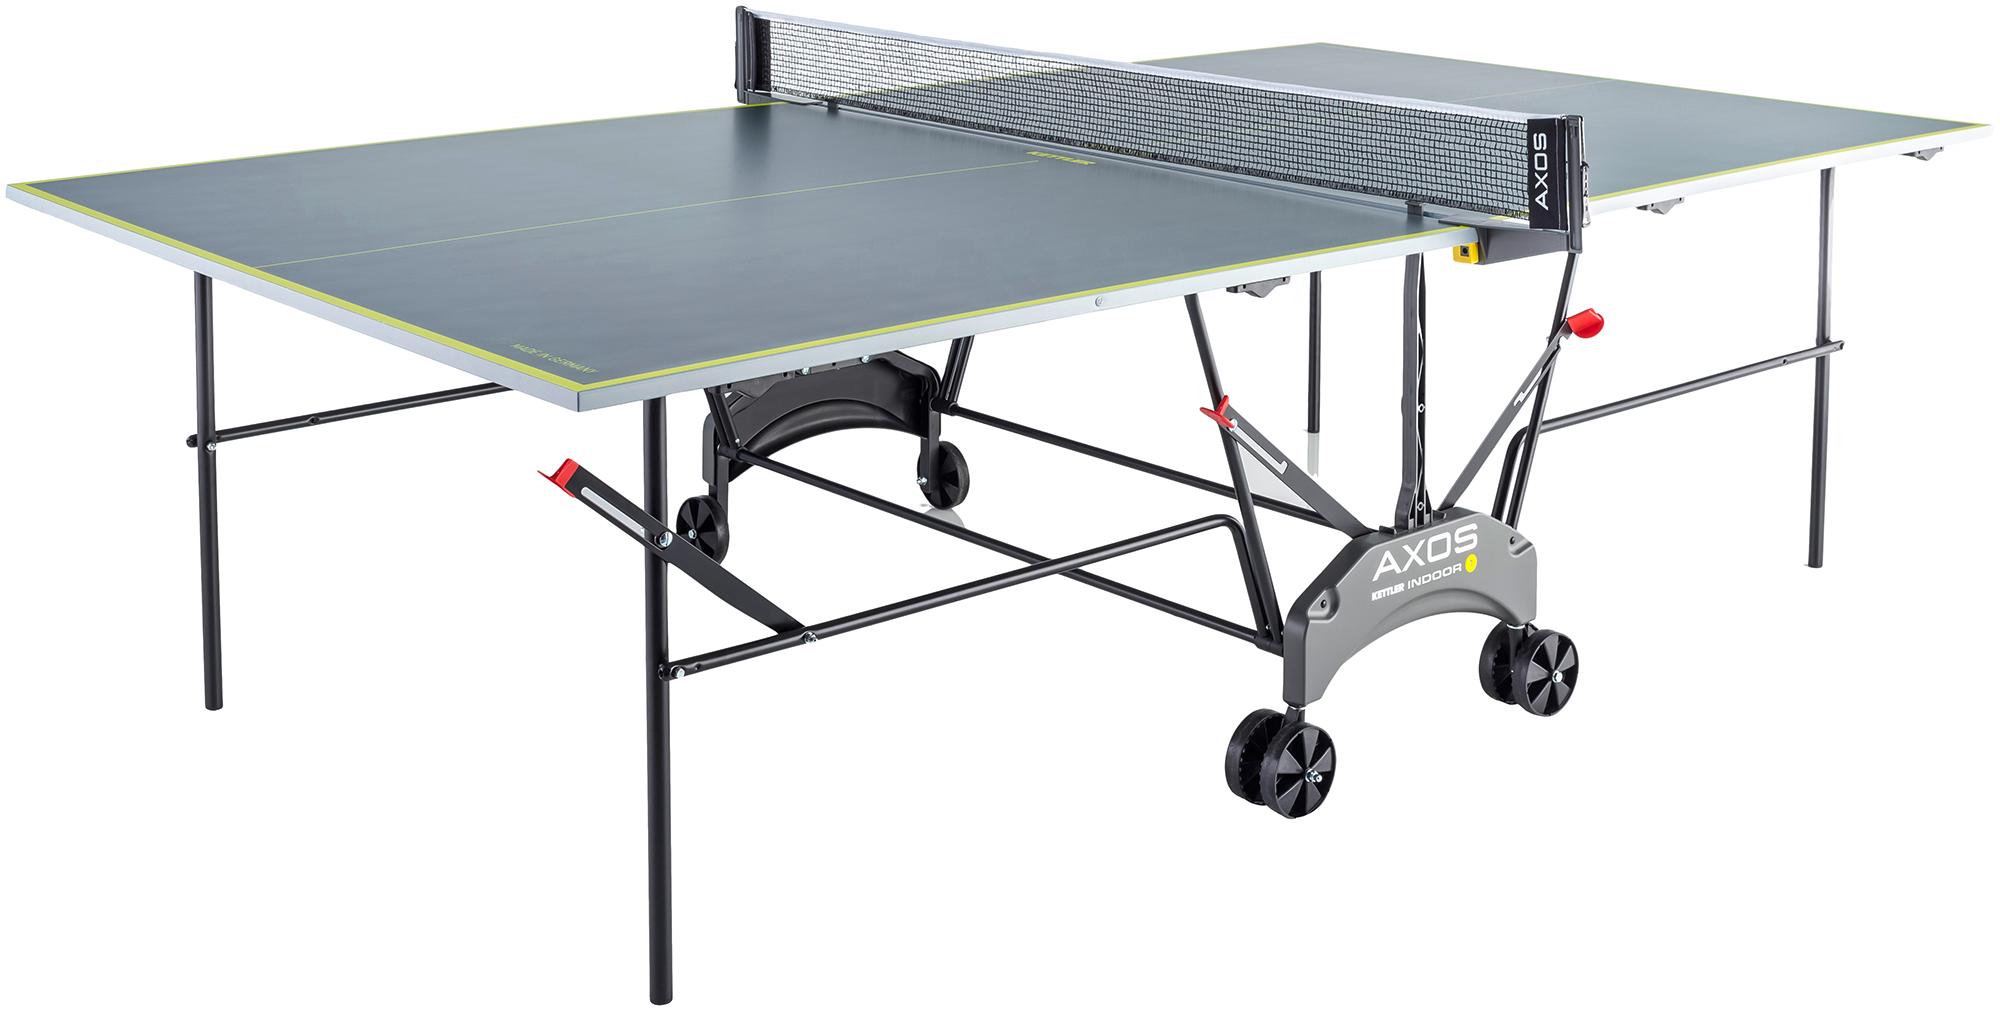 Kettler Теннисный стол для помещений Axos Indoor 1